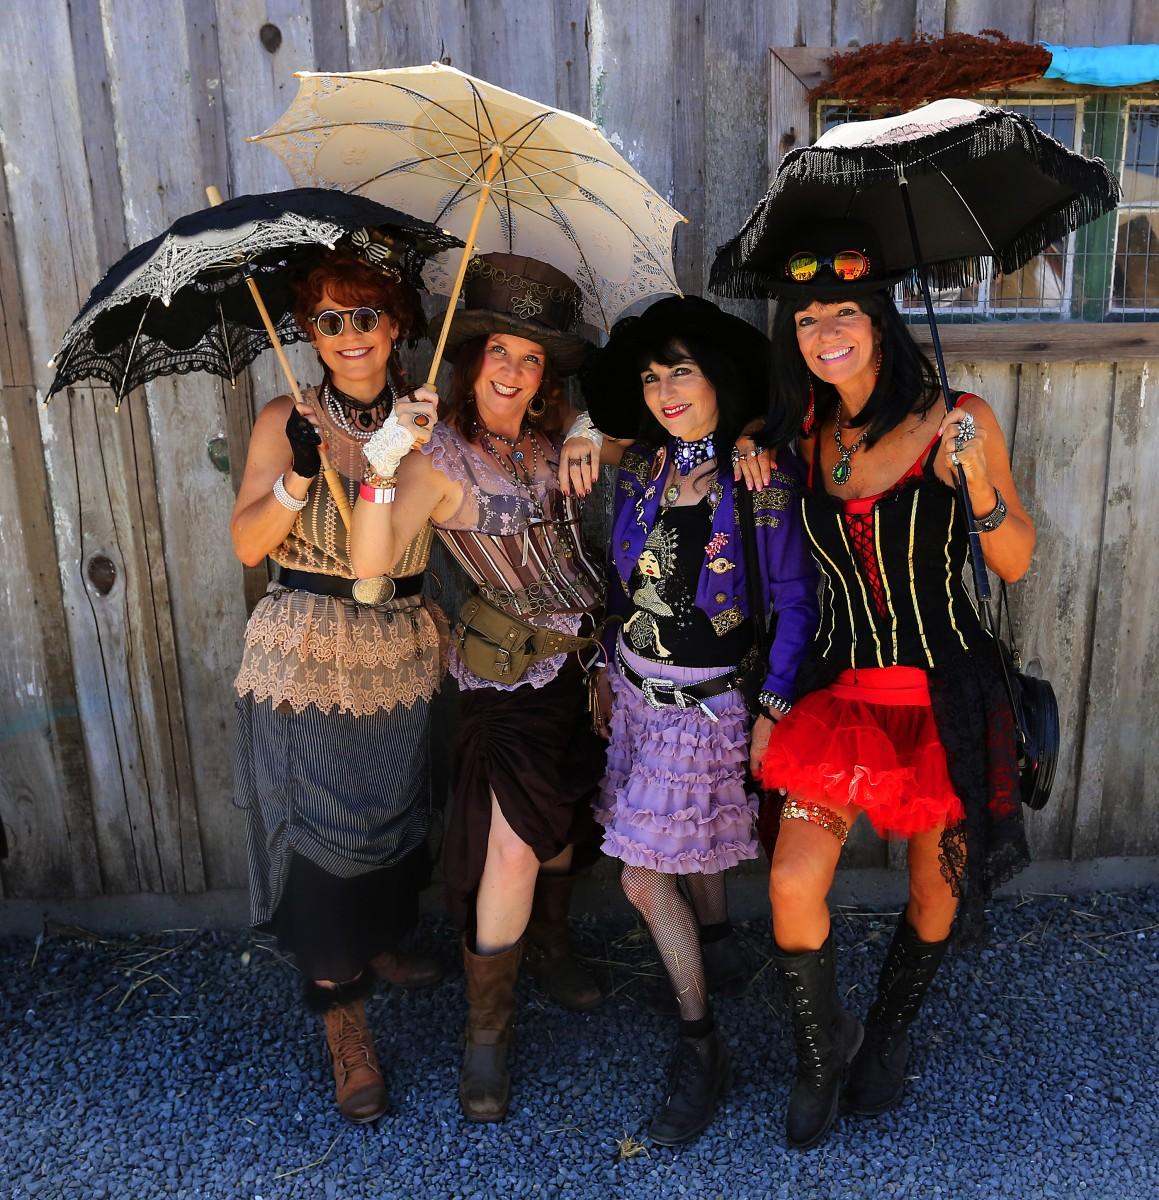 Music, costumes and fun at the Rivertown Revival in Petaluma. (Photo by John Burgess)